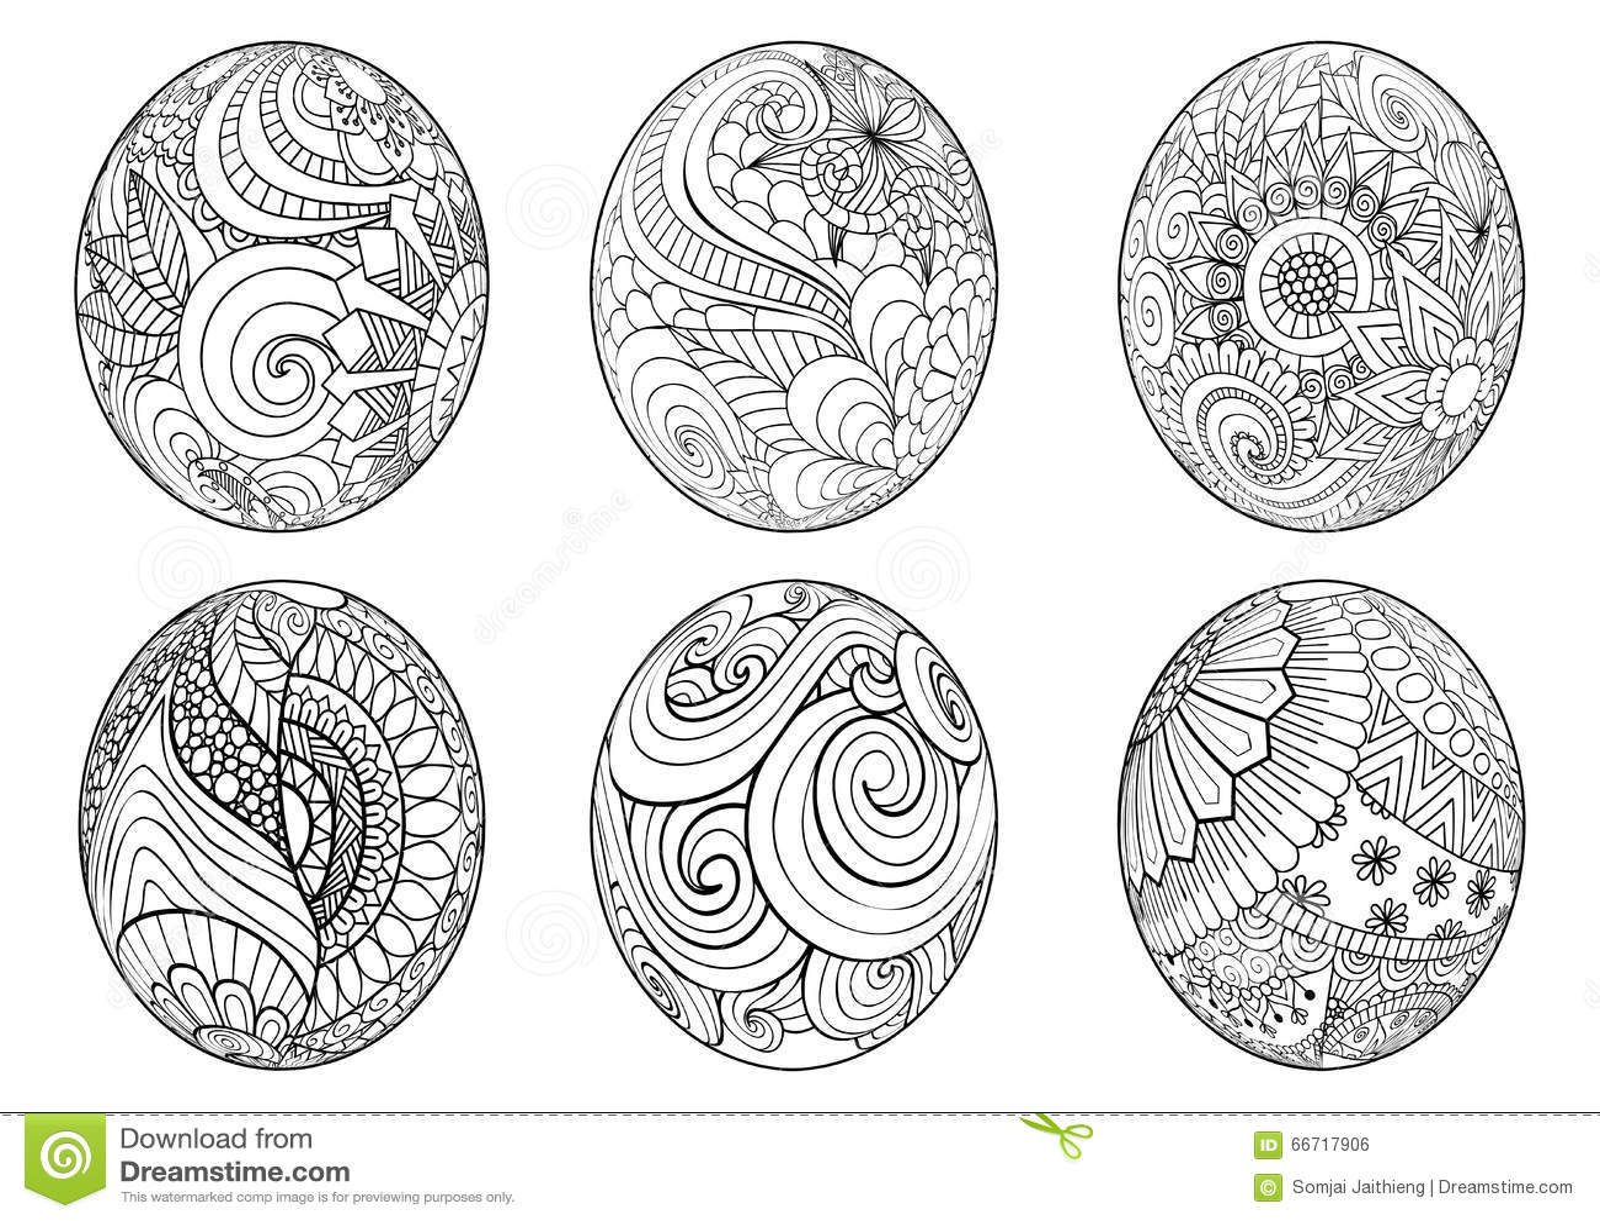 Coloriage Mandala Oeuf De Paques.Oeuf De Paque Coloriage Stunning Coloriage Oeuf De Pques Dessin